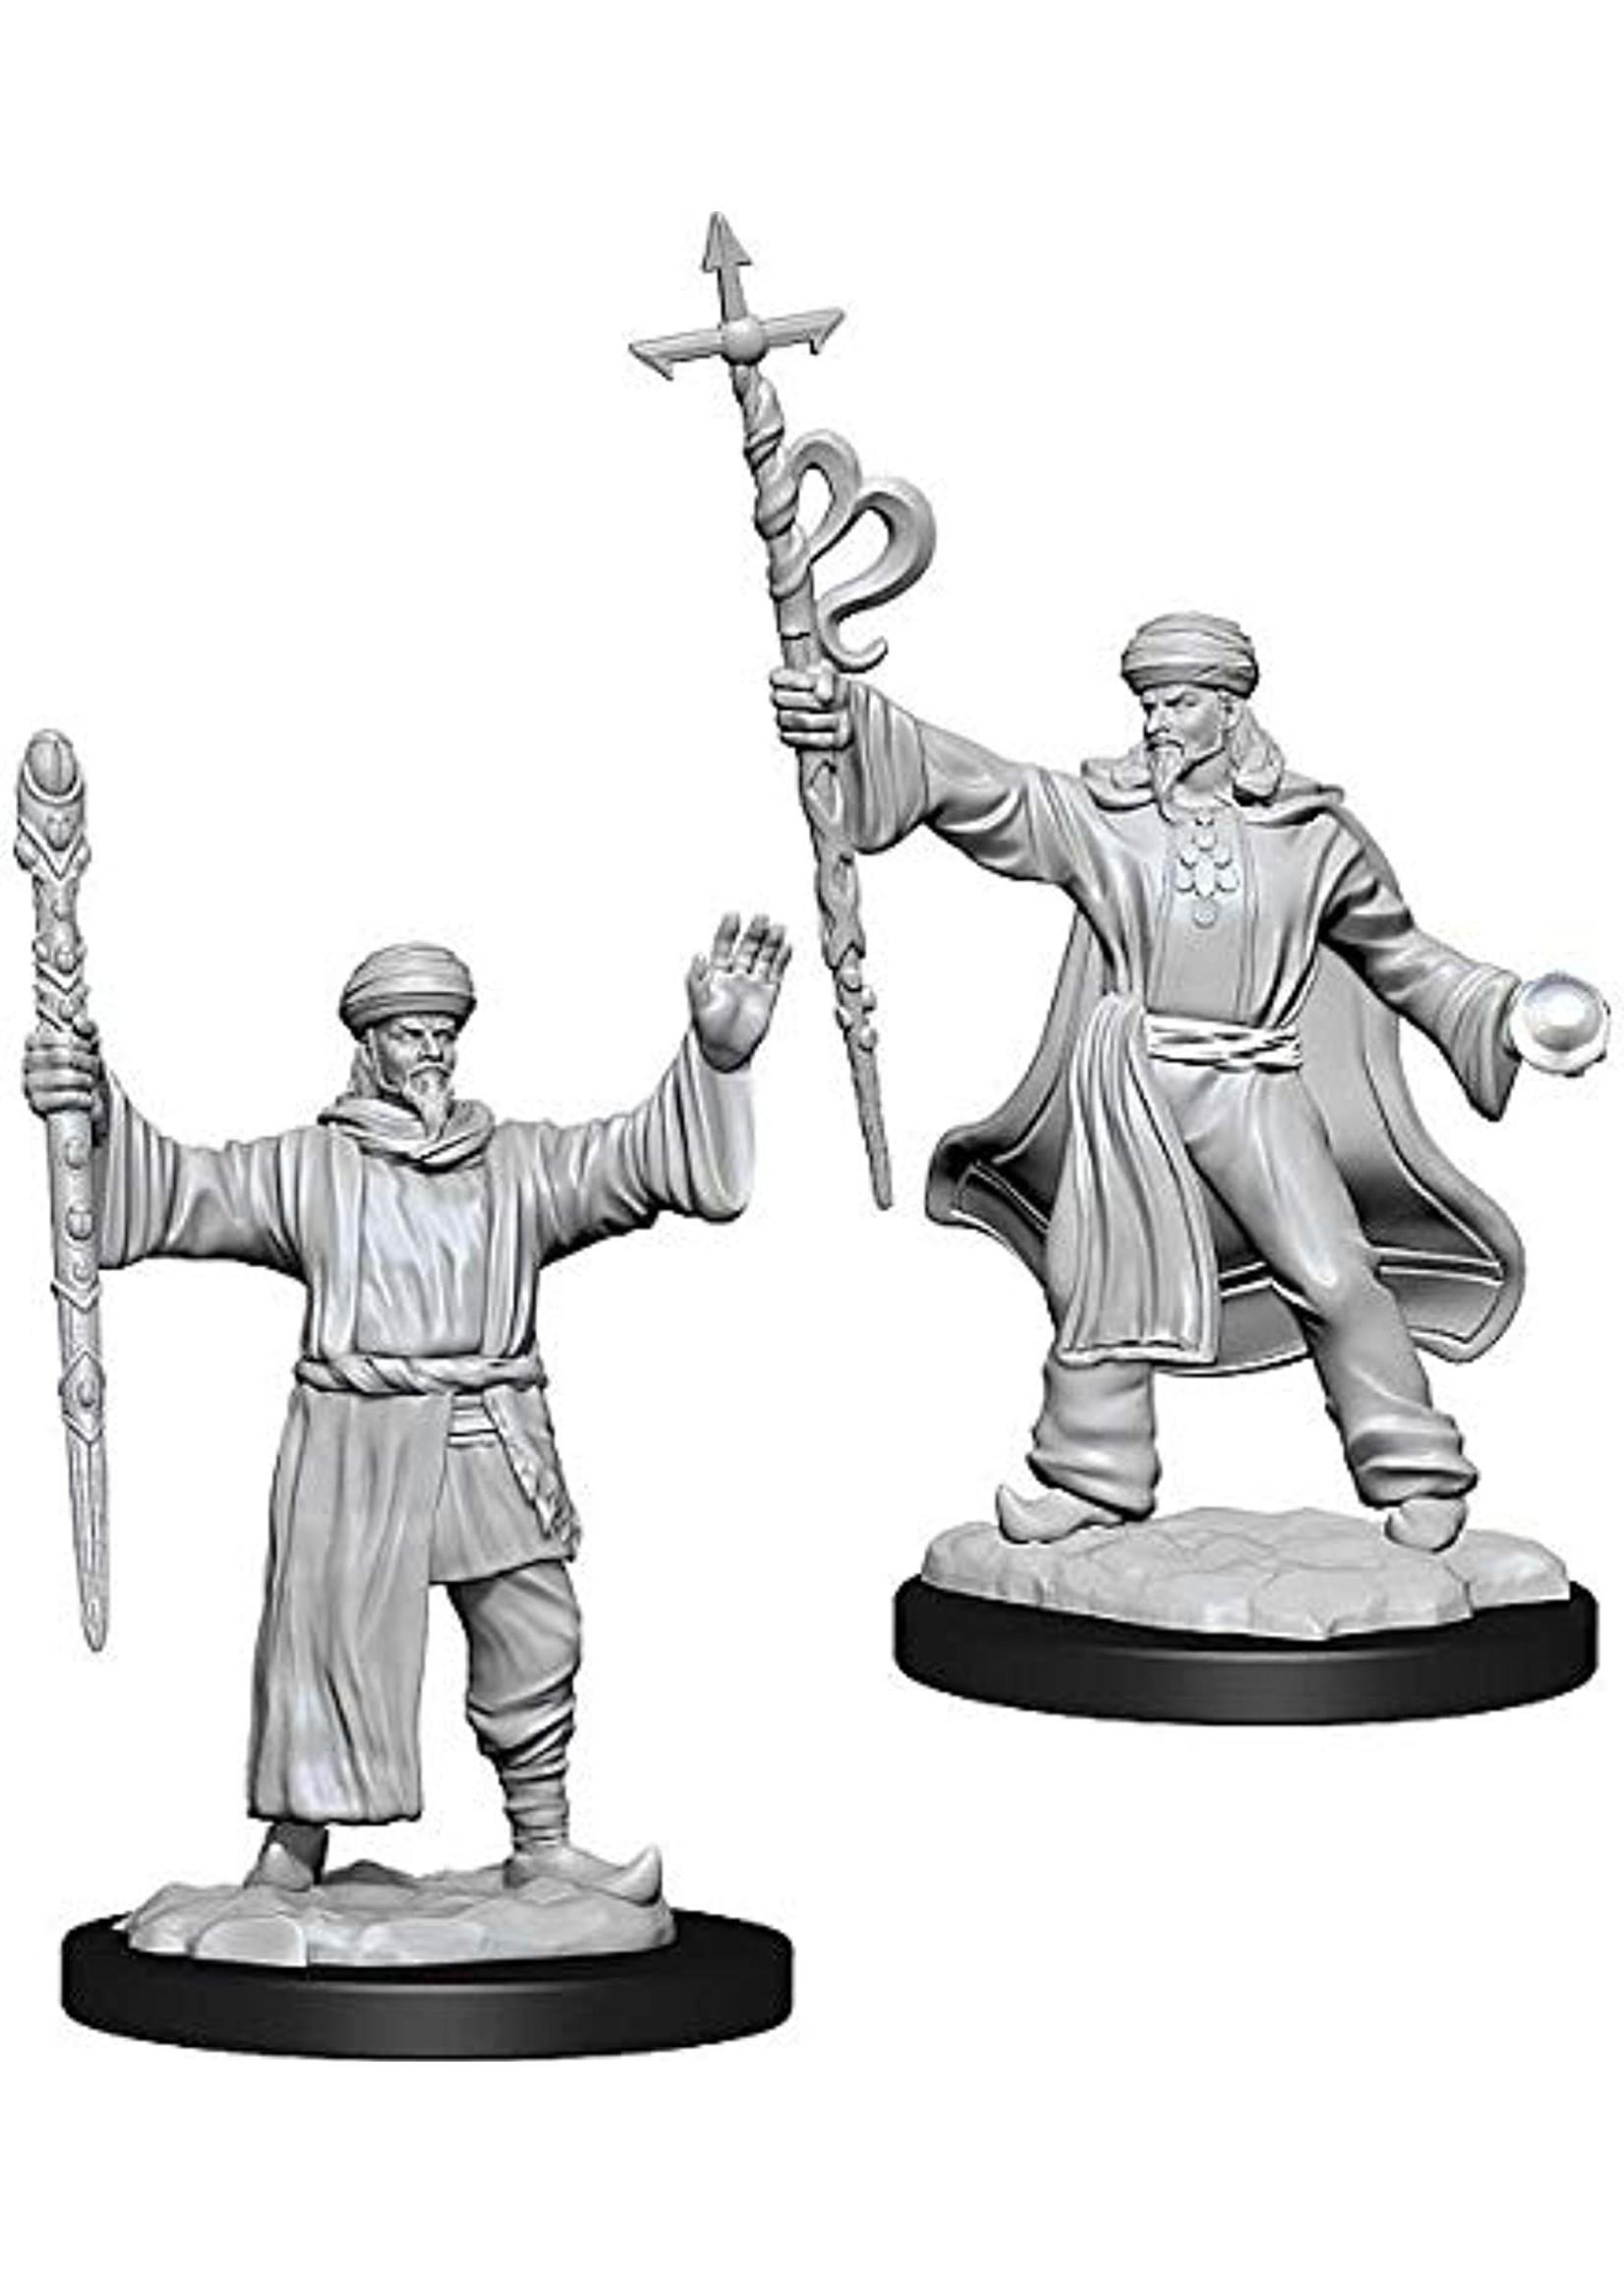 Dungeons & Dragons Nolzur`s Marvelous Unpainted Miniatures: W13 Human Wizard Male